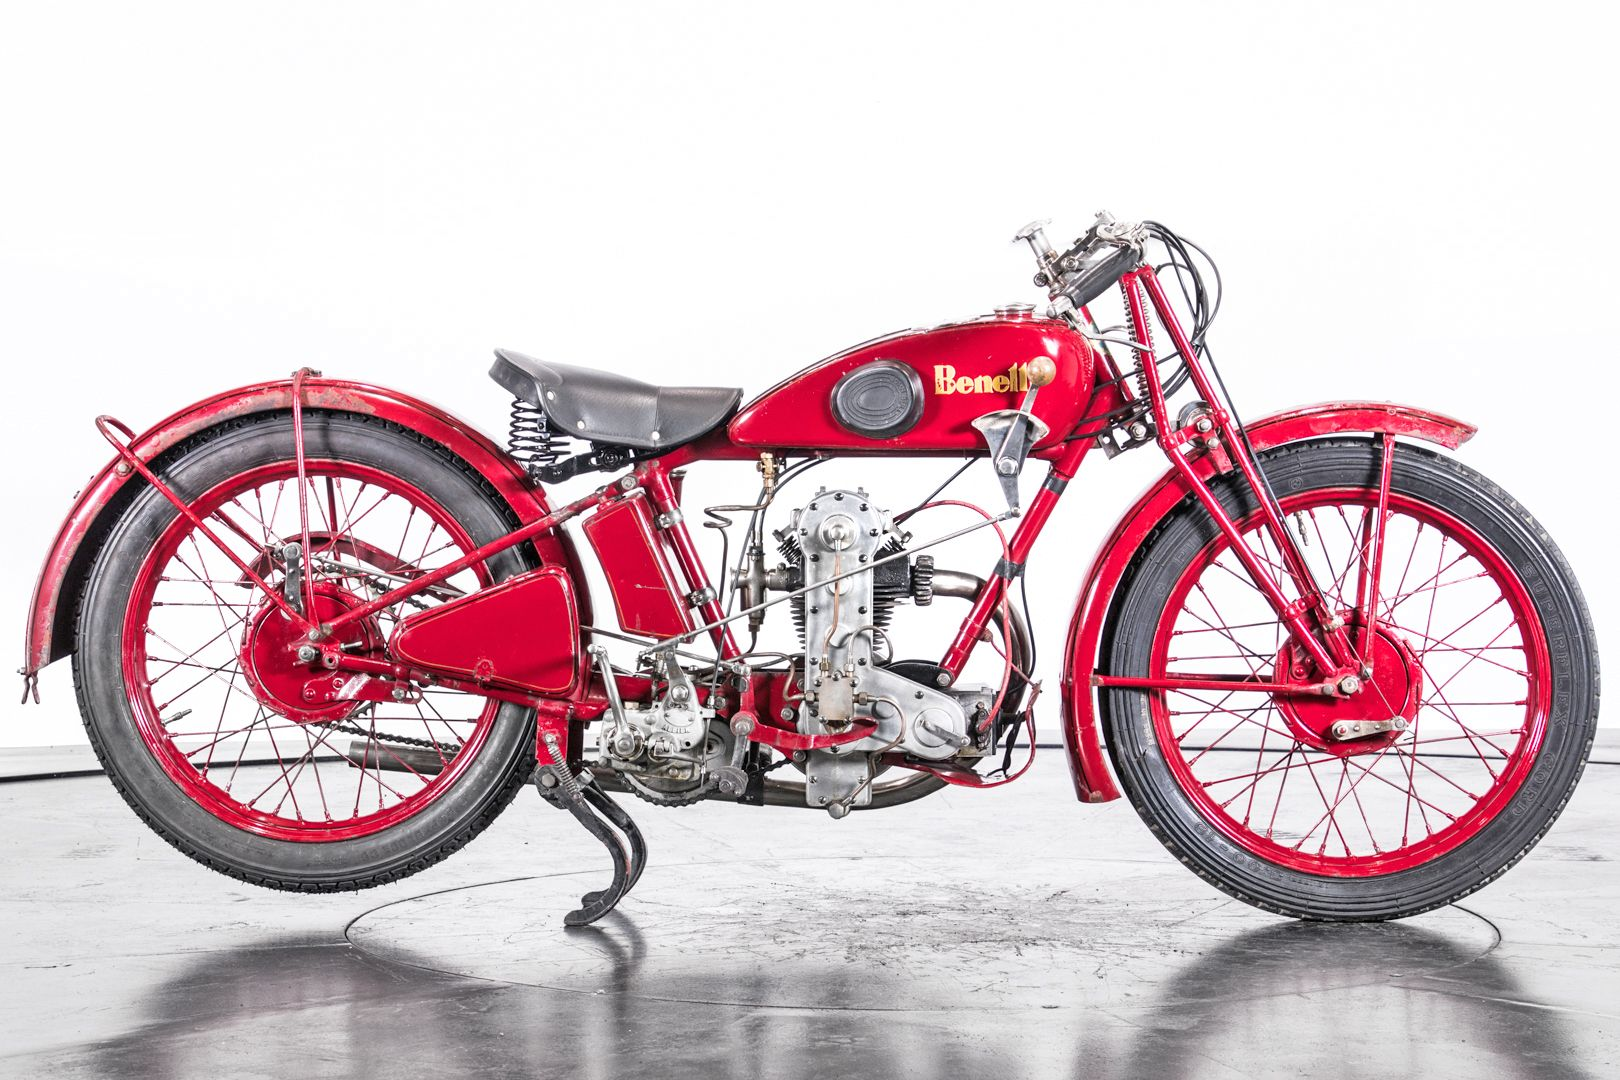 1930 Benelli 175 74348